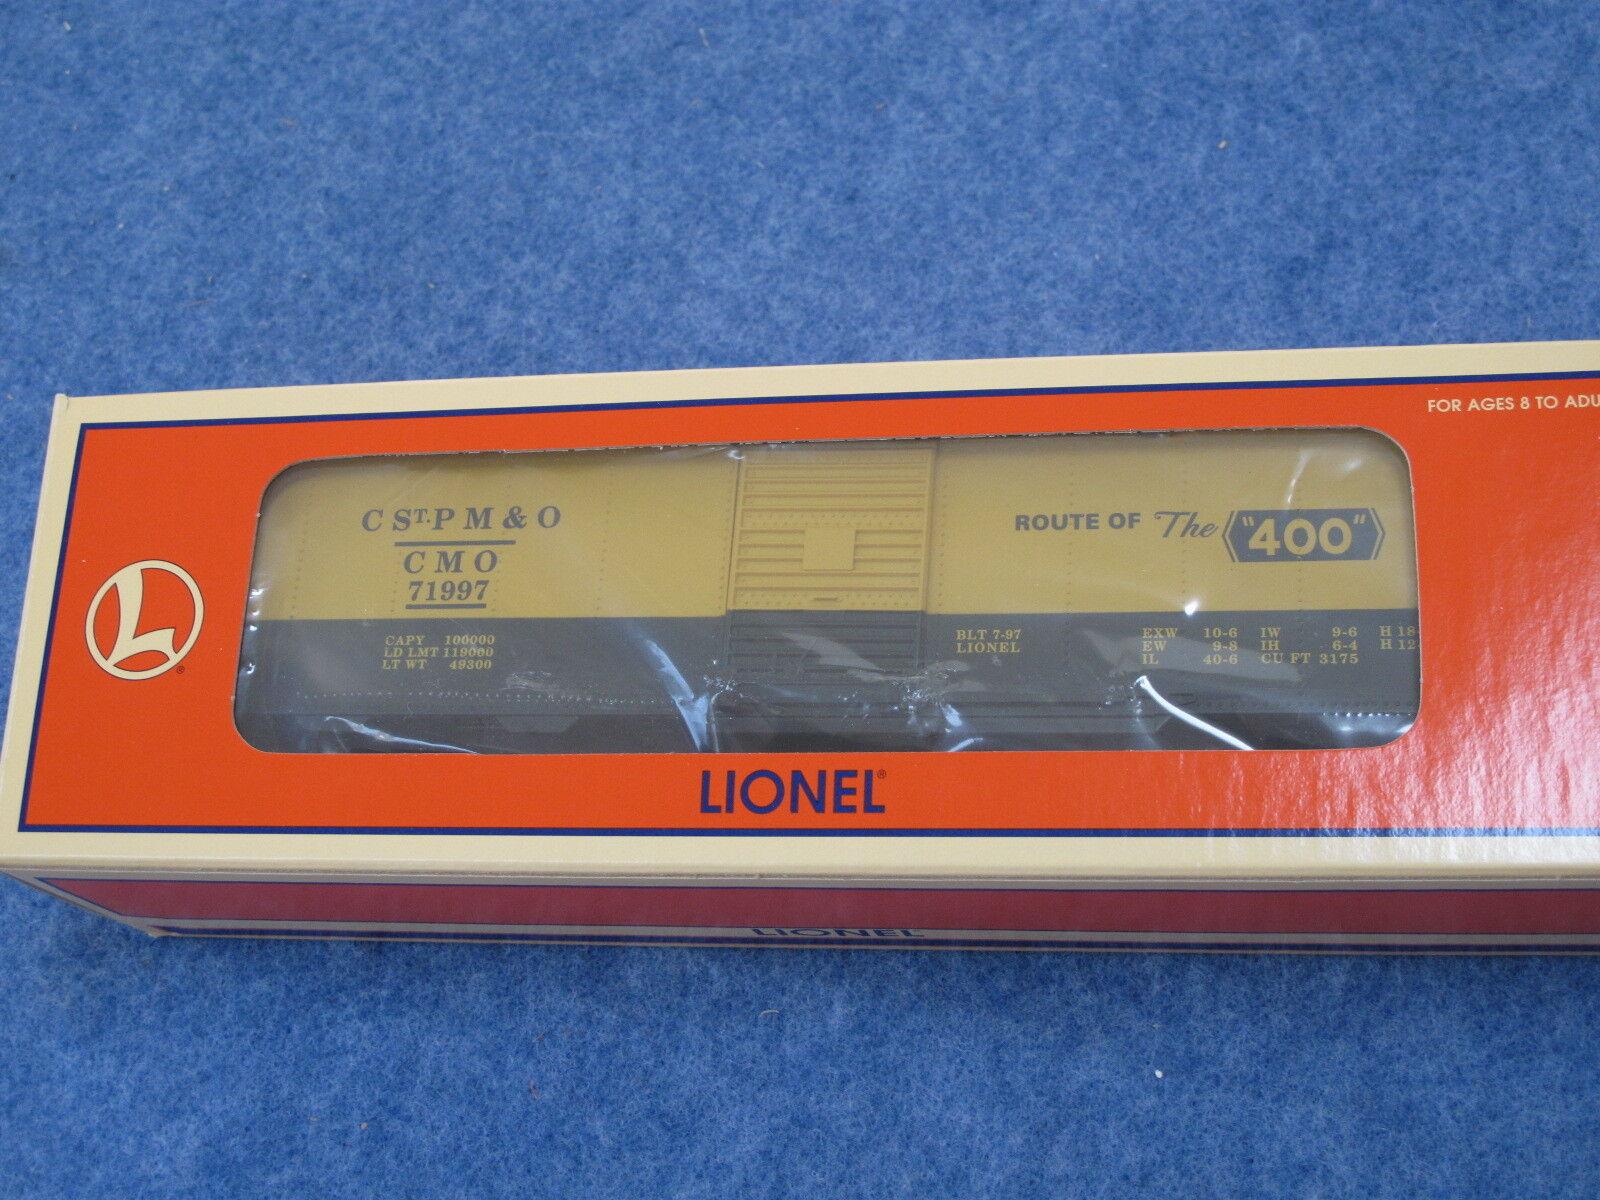 1997 Lionel 6-52110 LCCA Convention Car C St. PM&O Box Car L1333